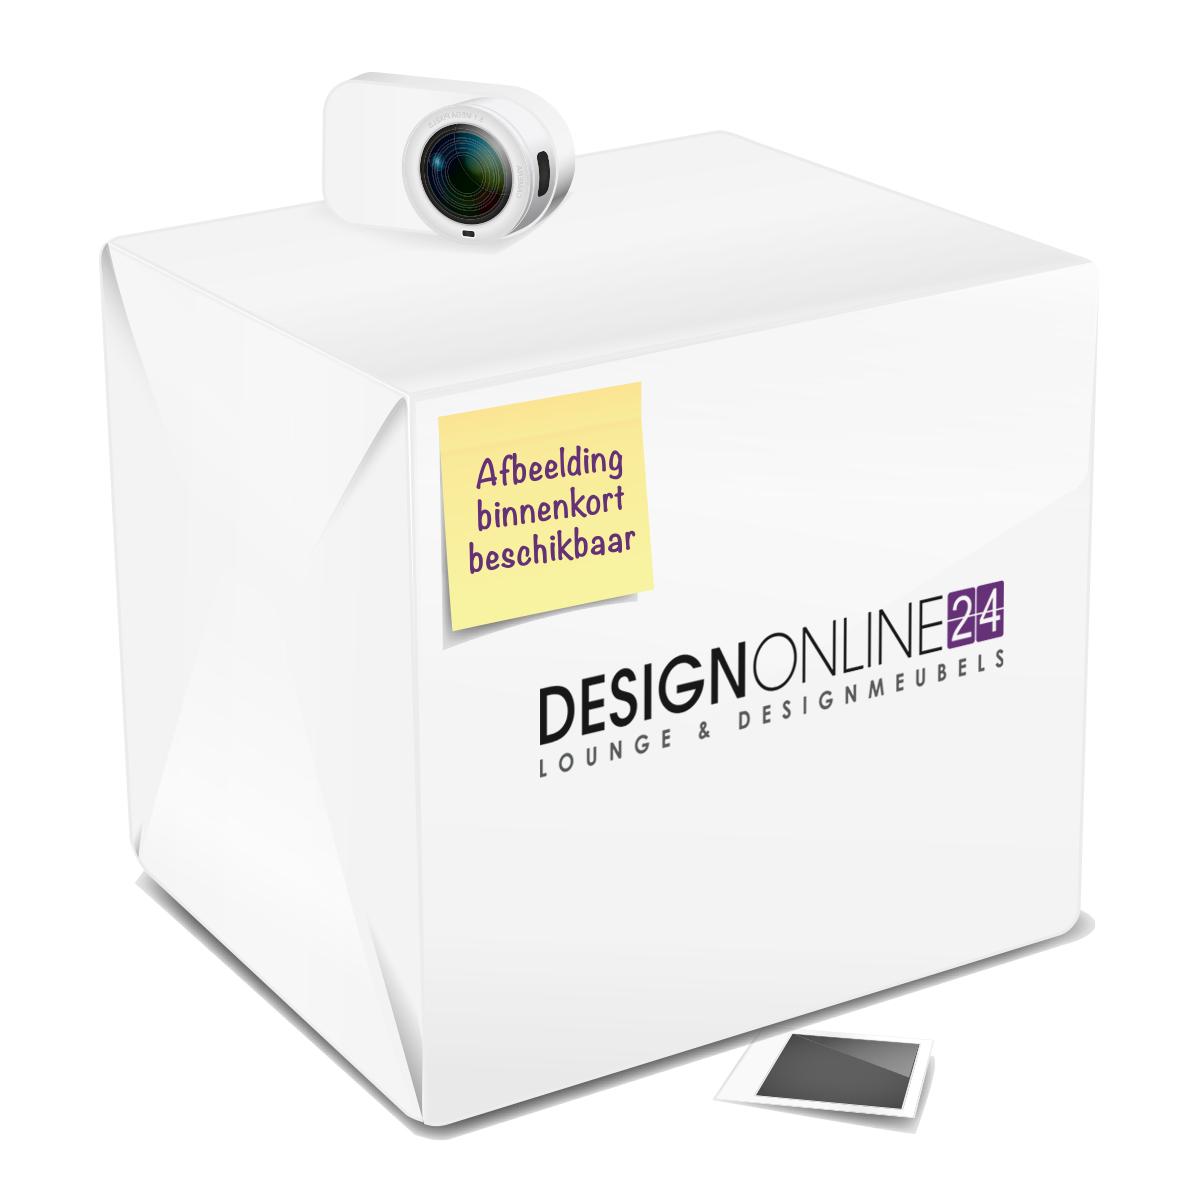 Innovation Slaapbank Dublexo Armleuningen - Styletto Poten Donker - Twist Charcoal 563 - Grijs